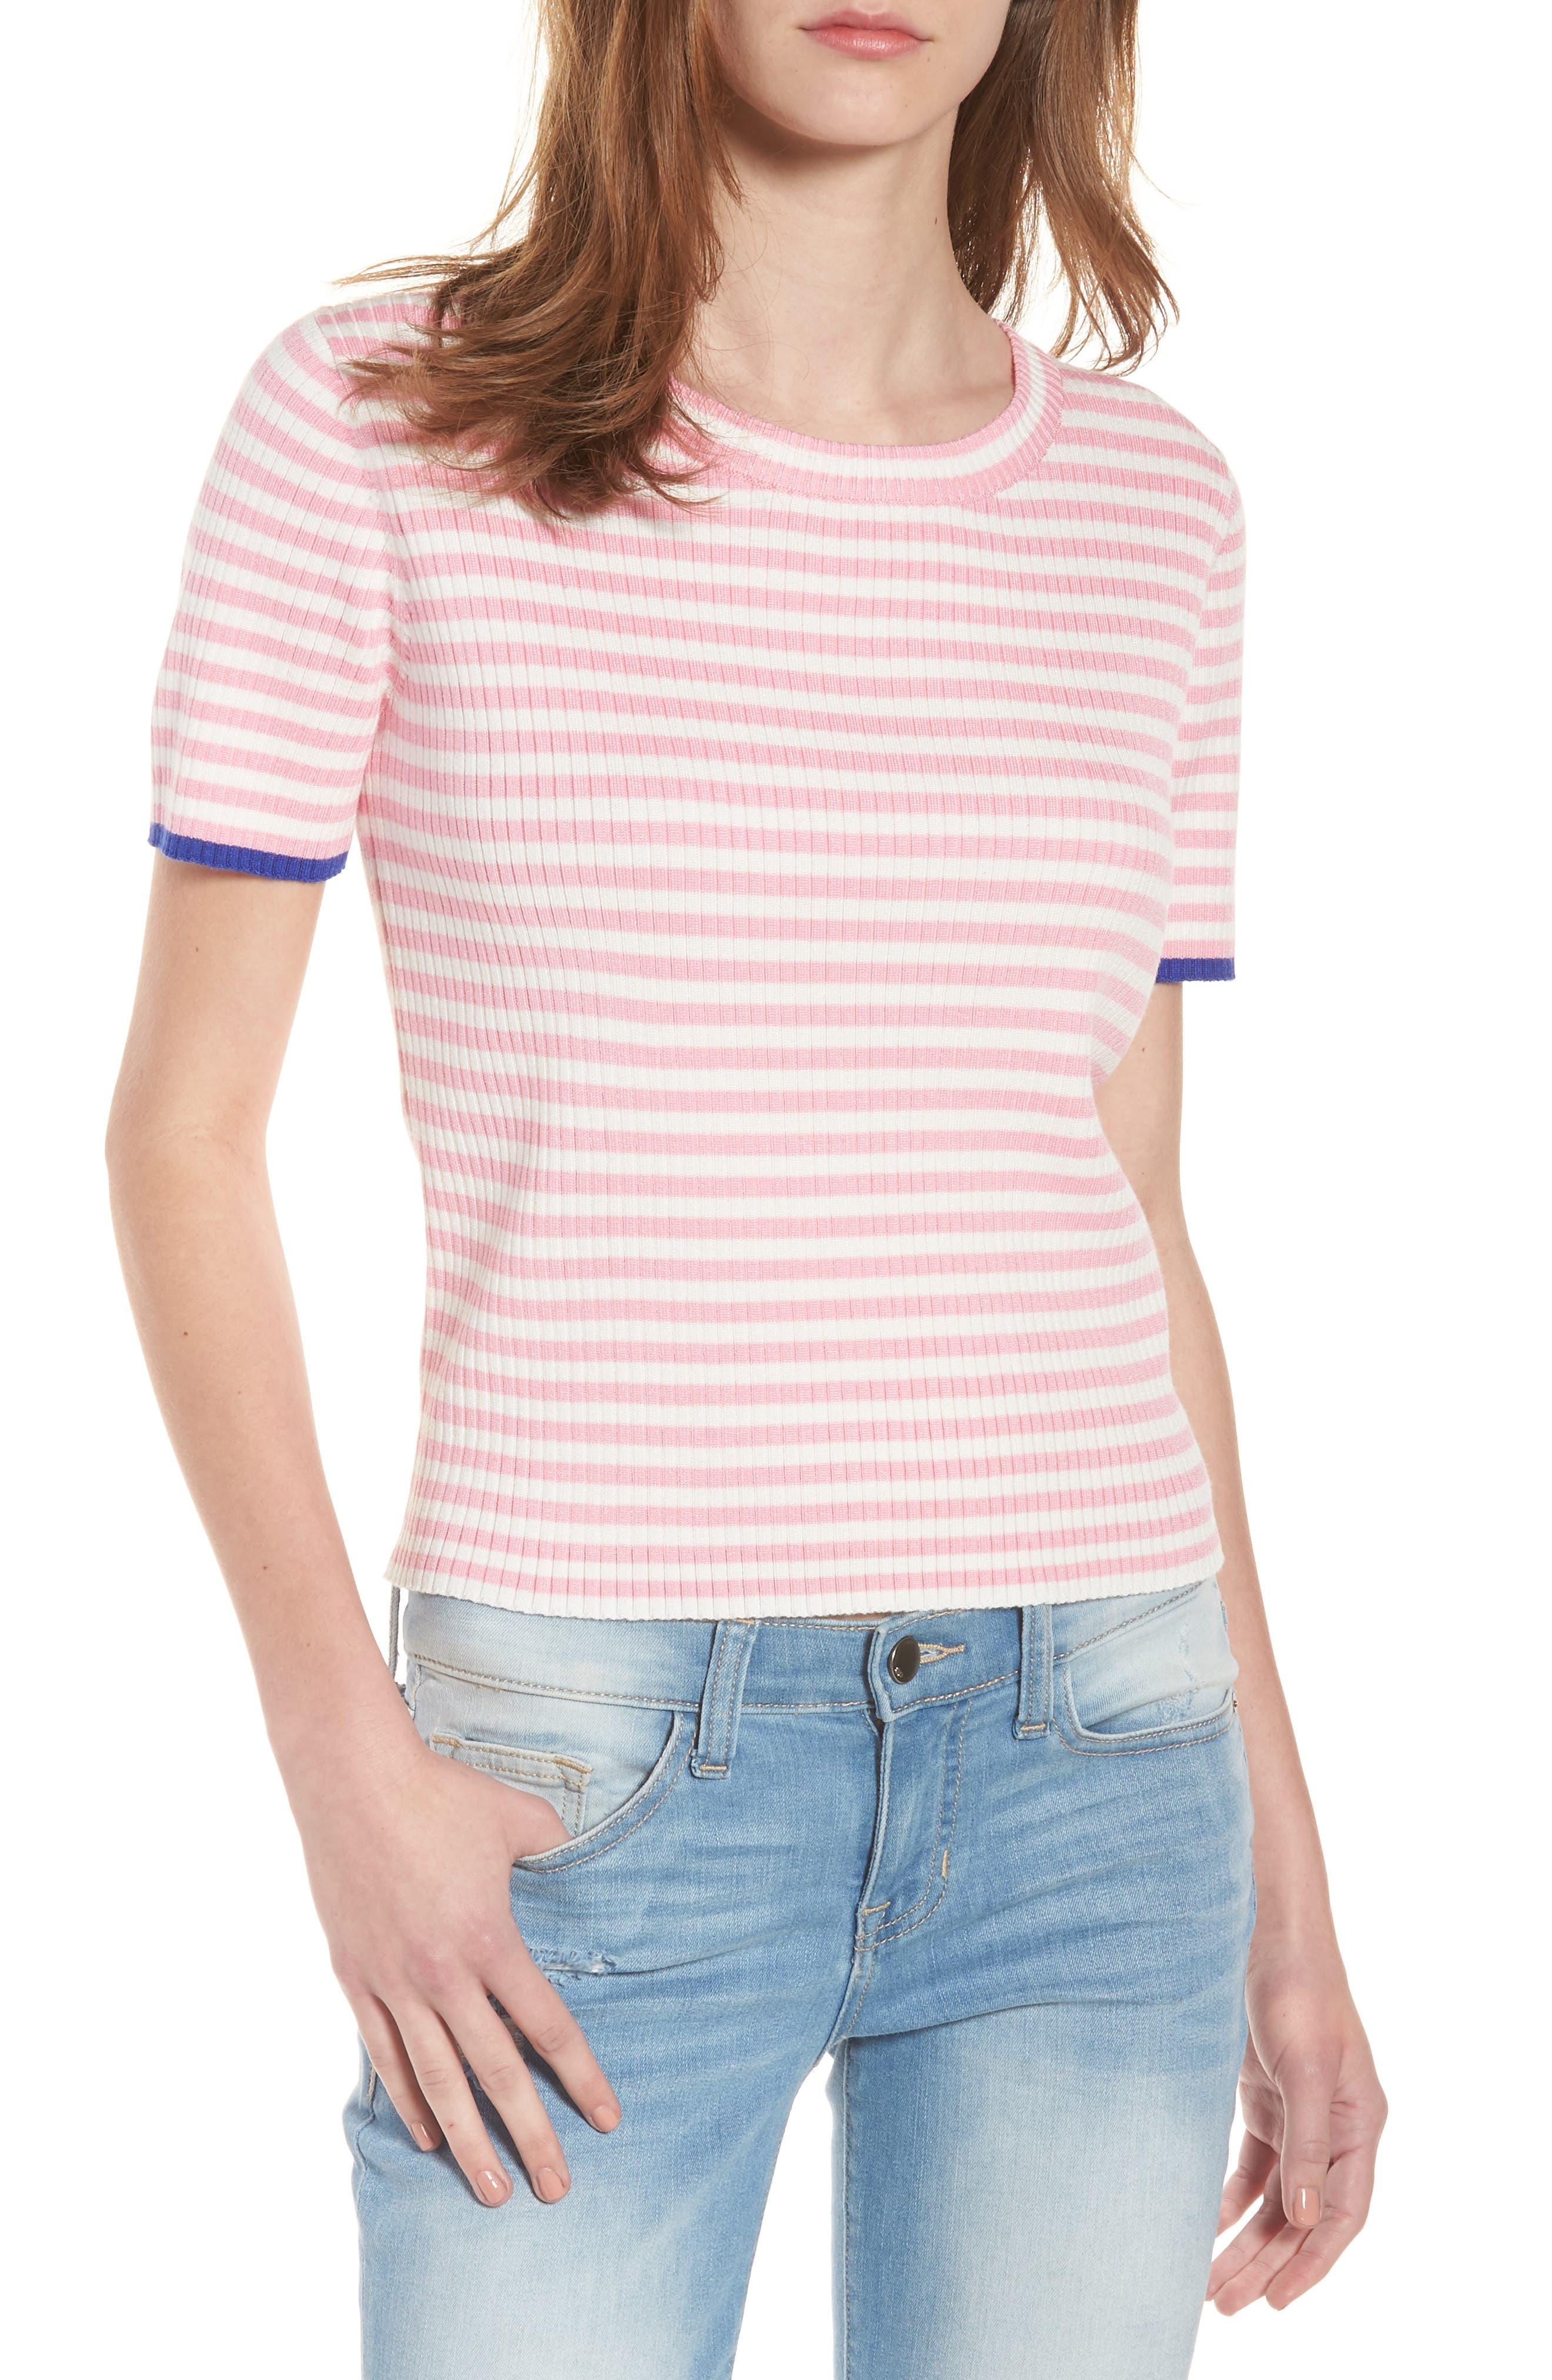 Cotton Emporium Stripe Knit Pullover